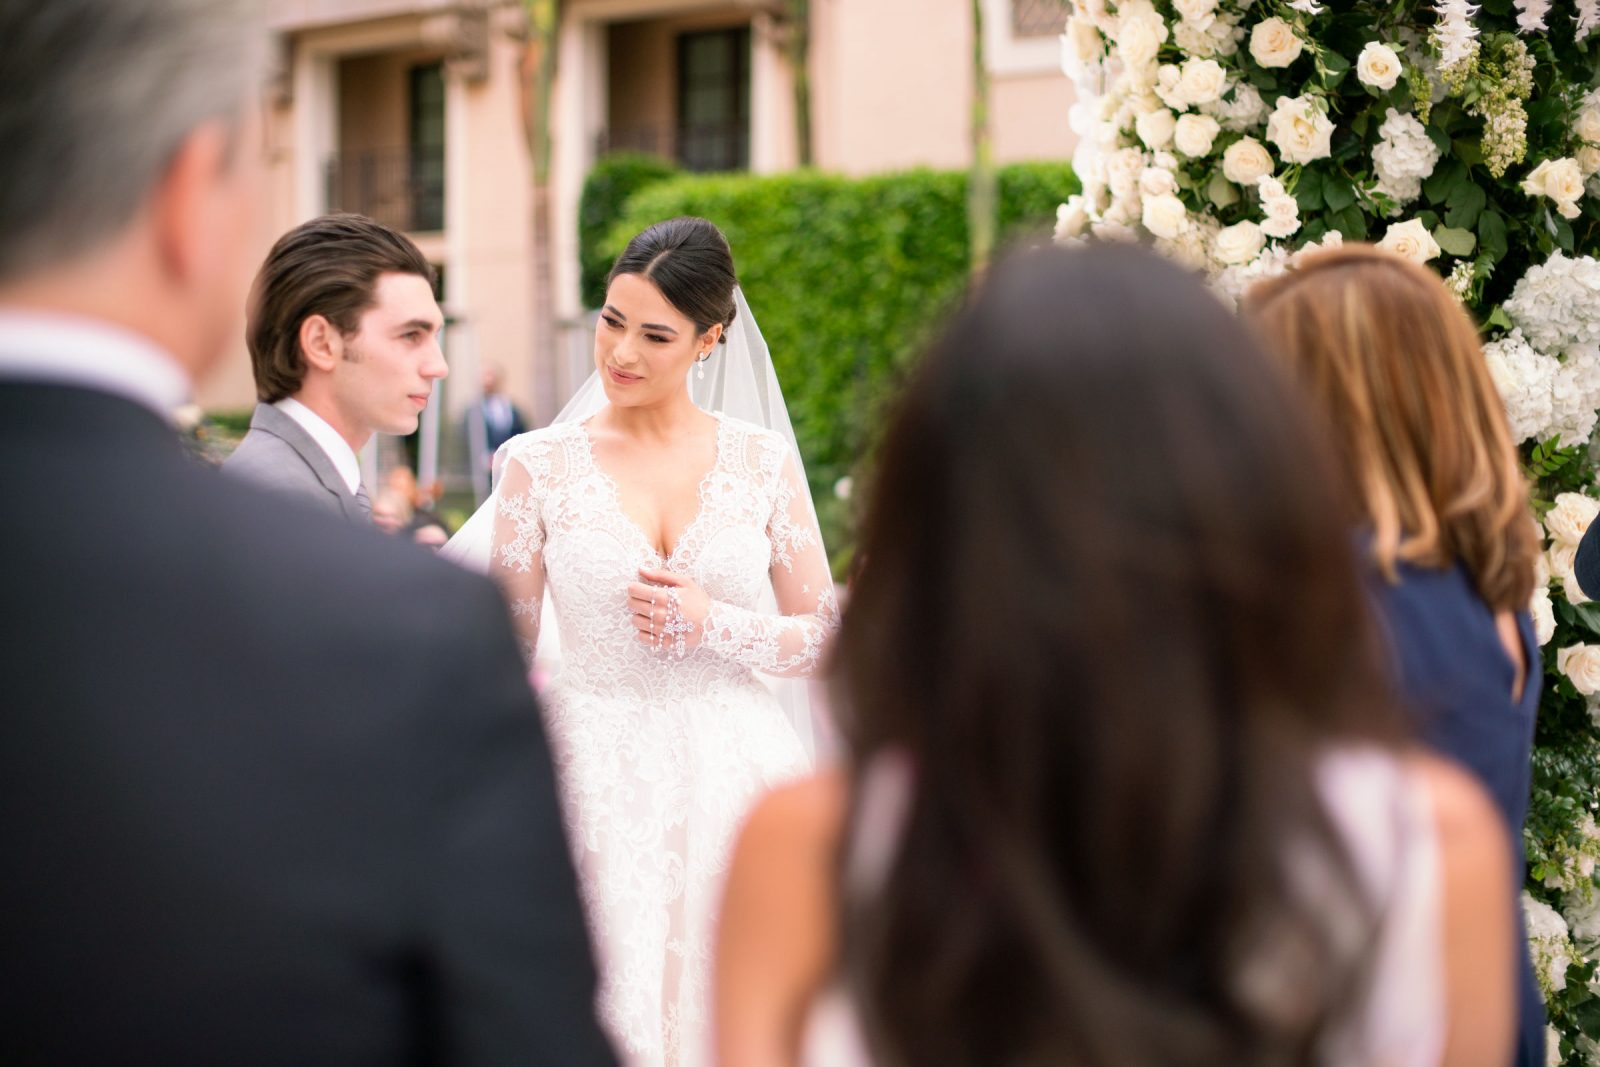 maria-eduardo-montage-beverly-hills-wedding-171.jpg